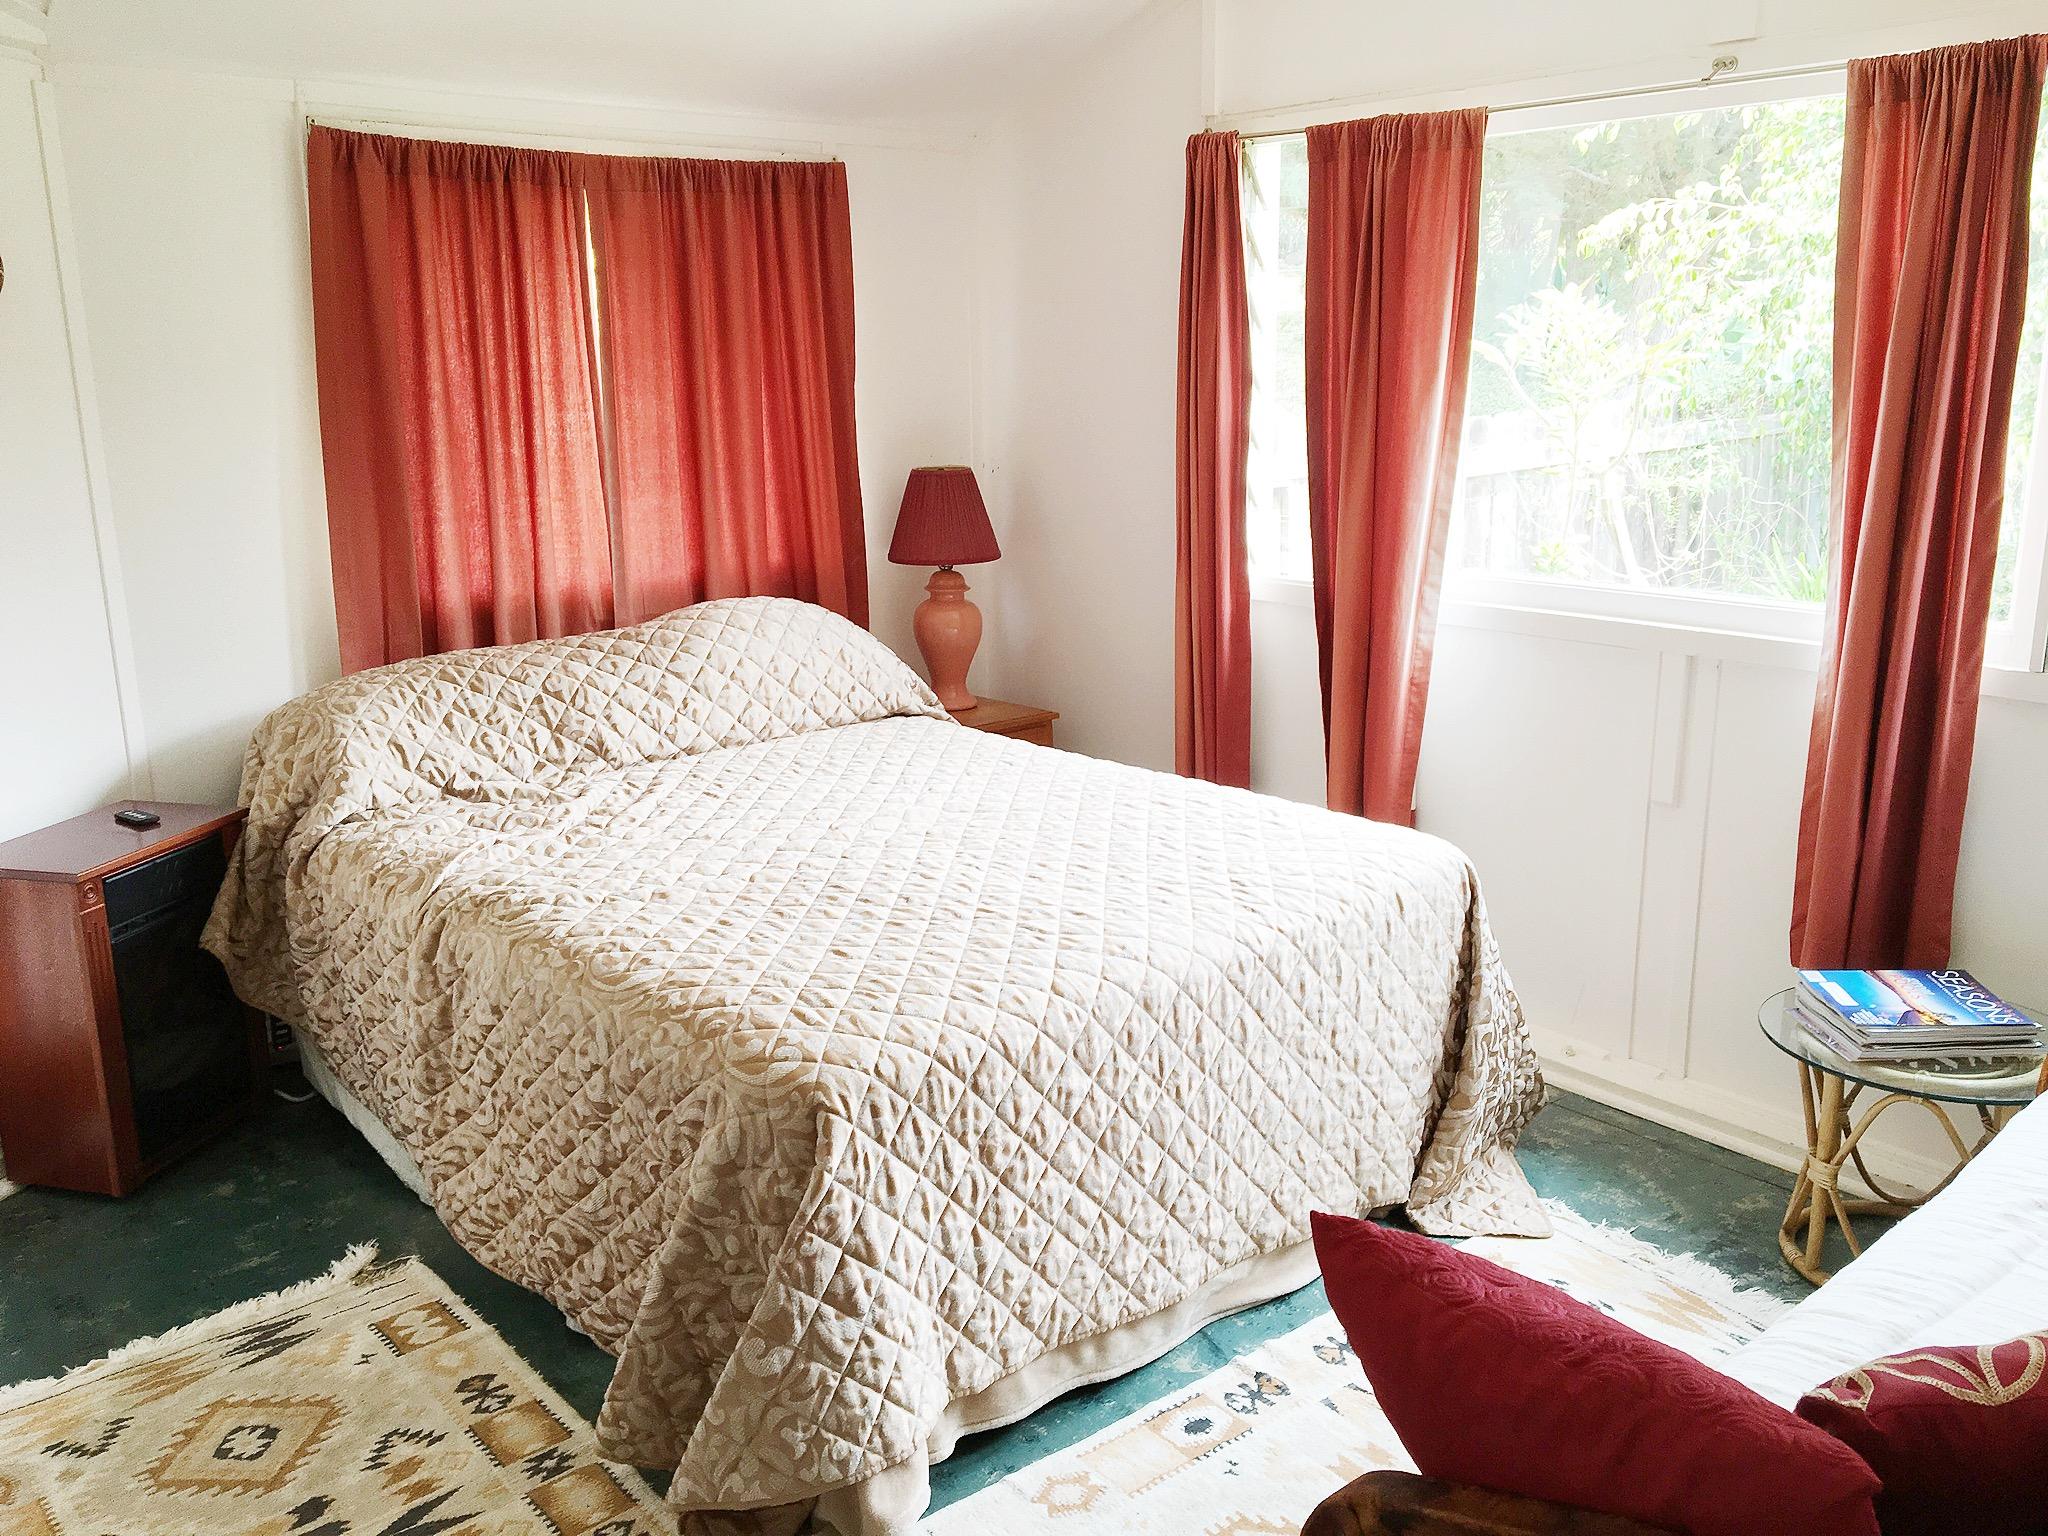 Boho Style California Airbnb Bedroom